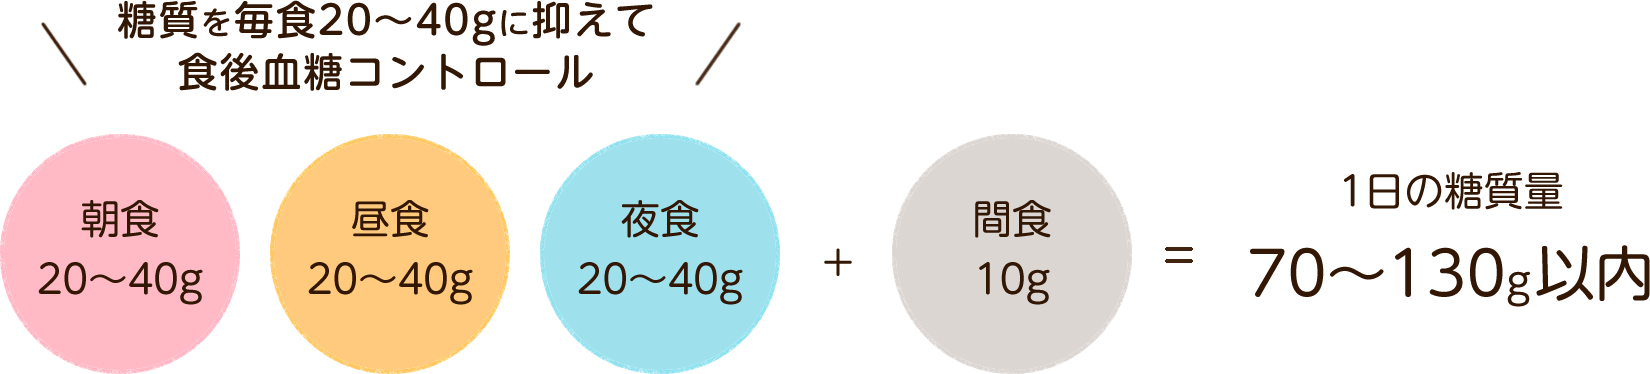 朝食20~40g/昼食20~40g/夜食20~40g+間食10g=1日の糖質量70~130g以内